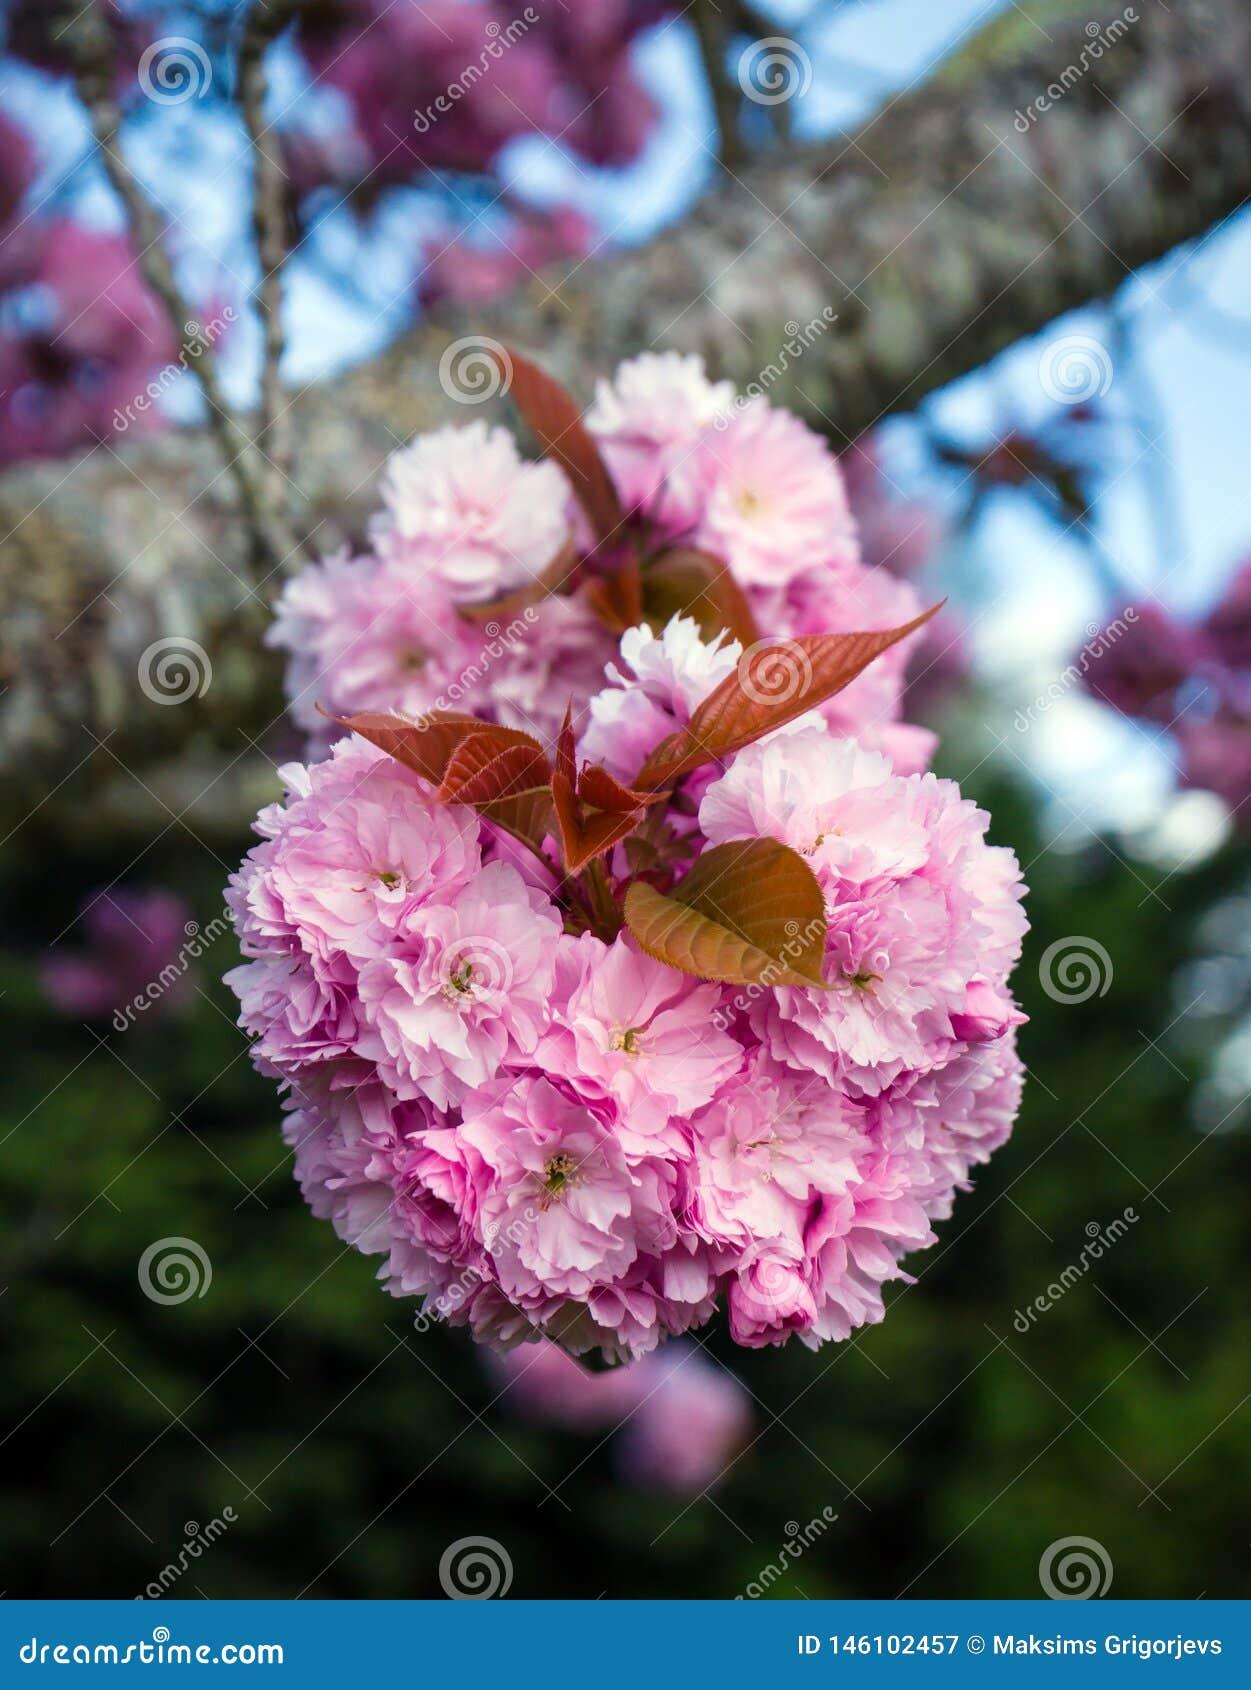 Sakura Cherry blüht Baum in voller Blüte